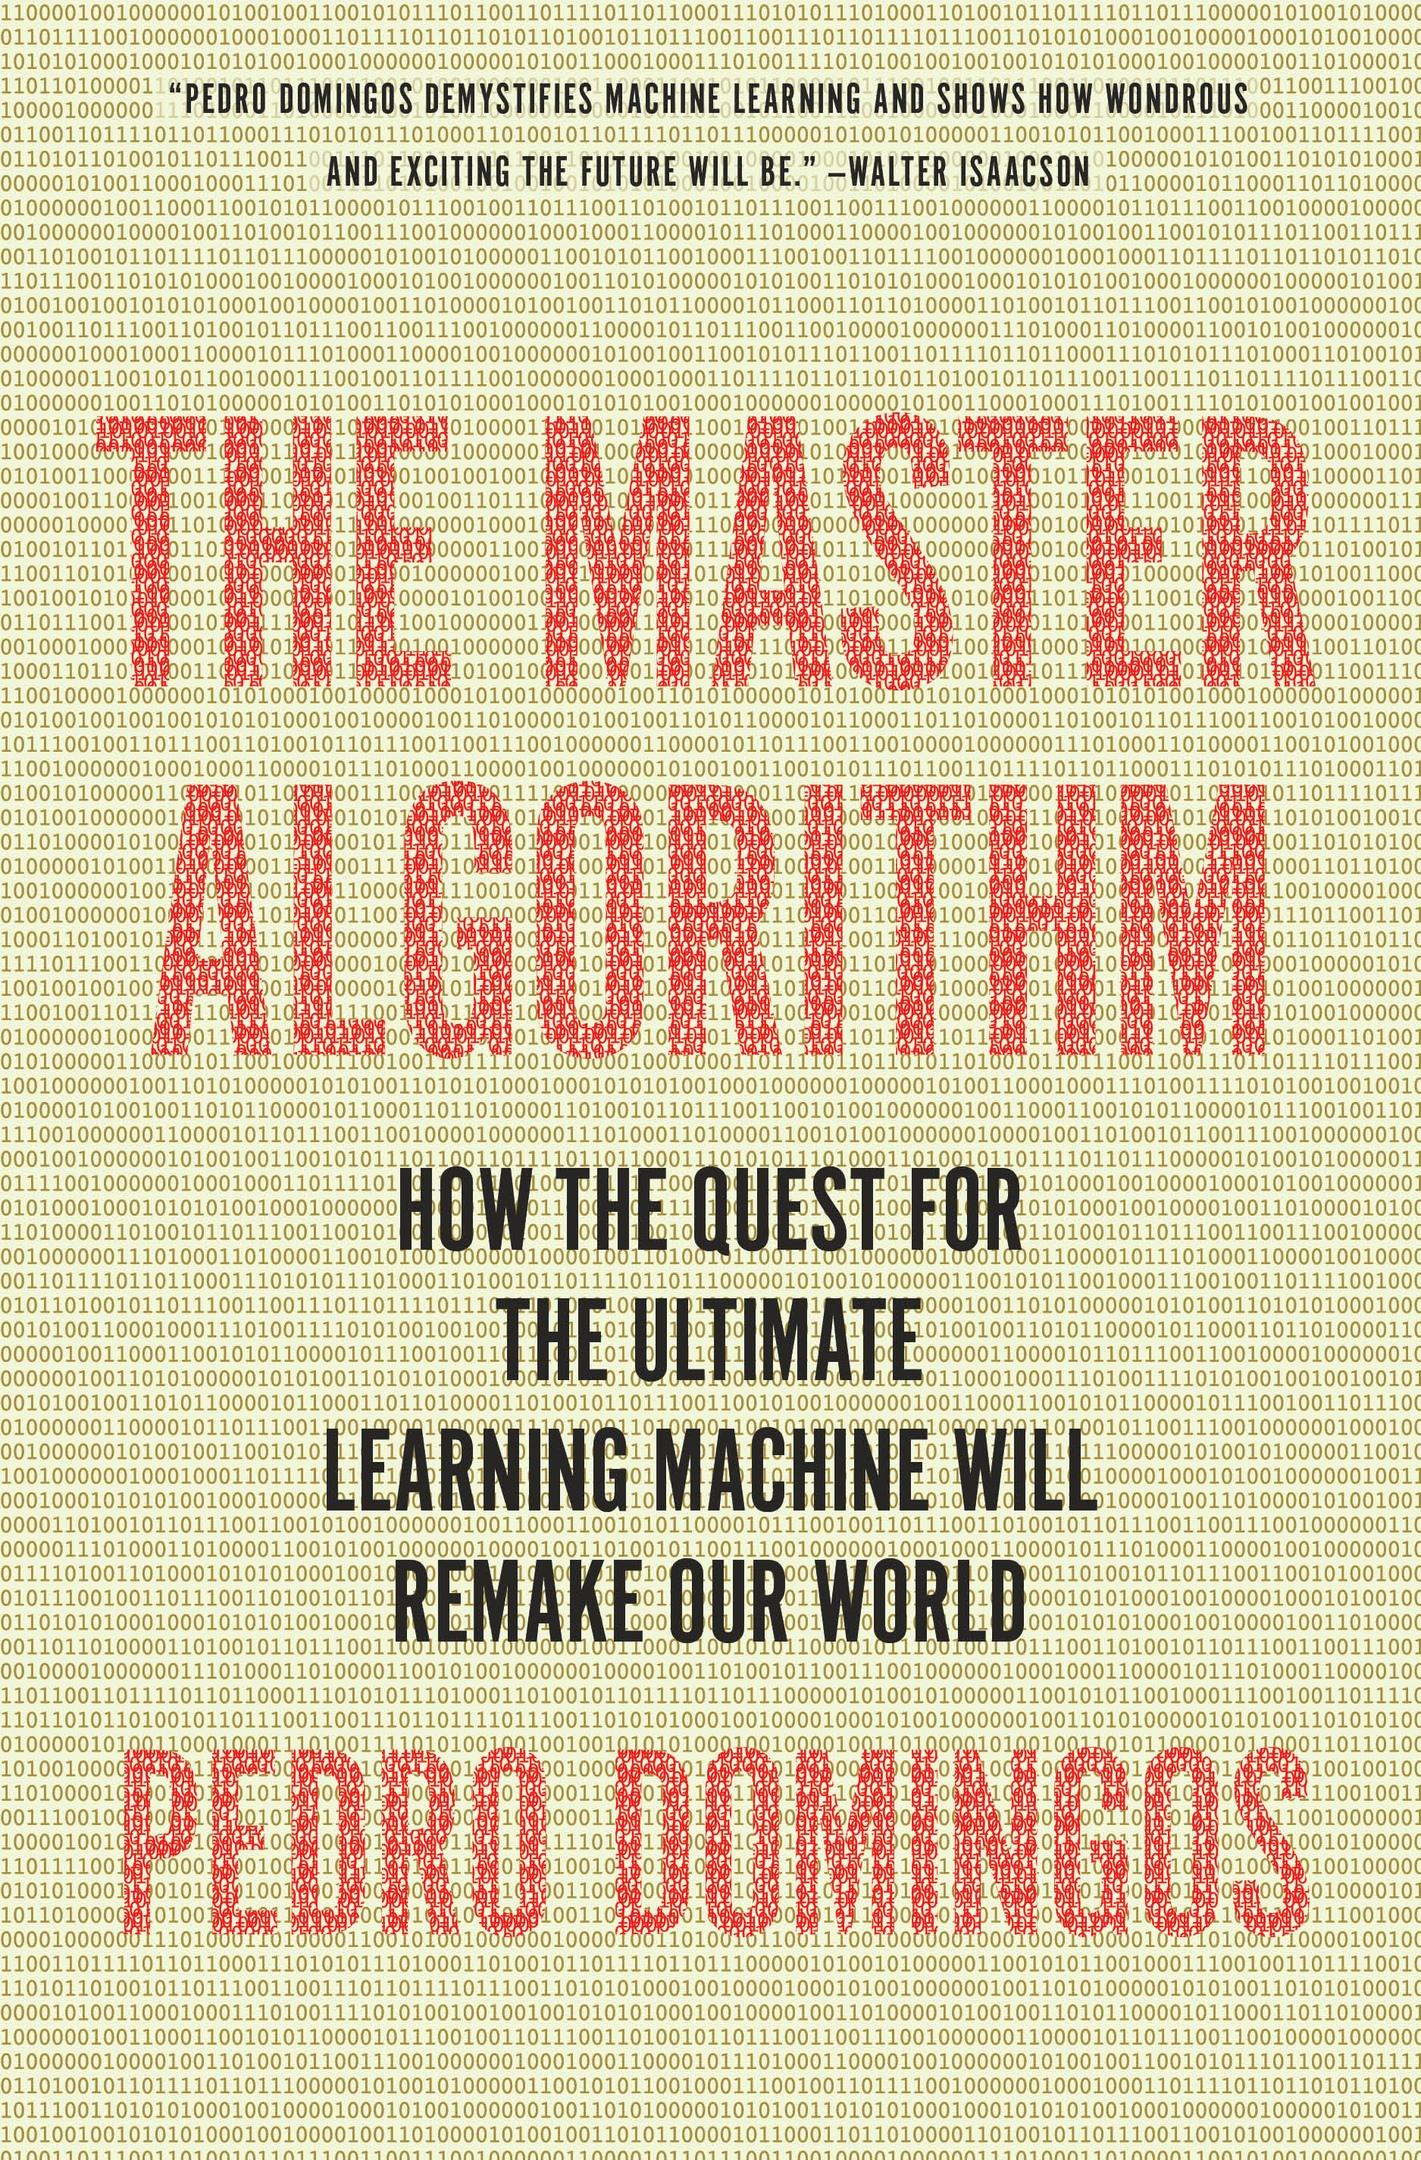 Pedro Domingos – The Master Algorithm